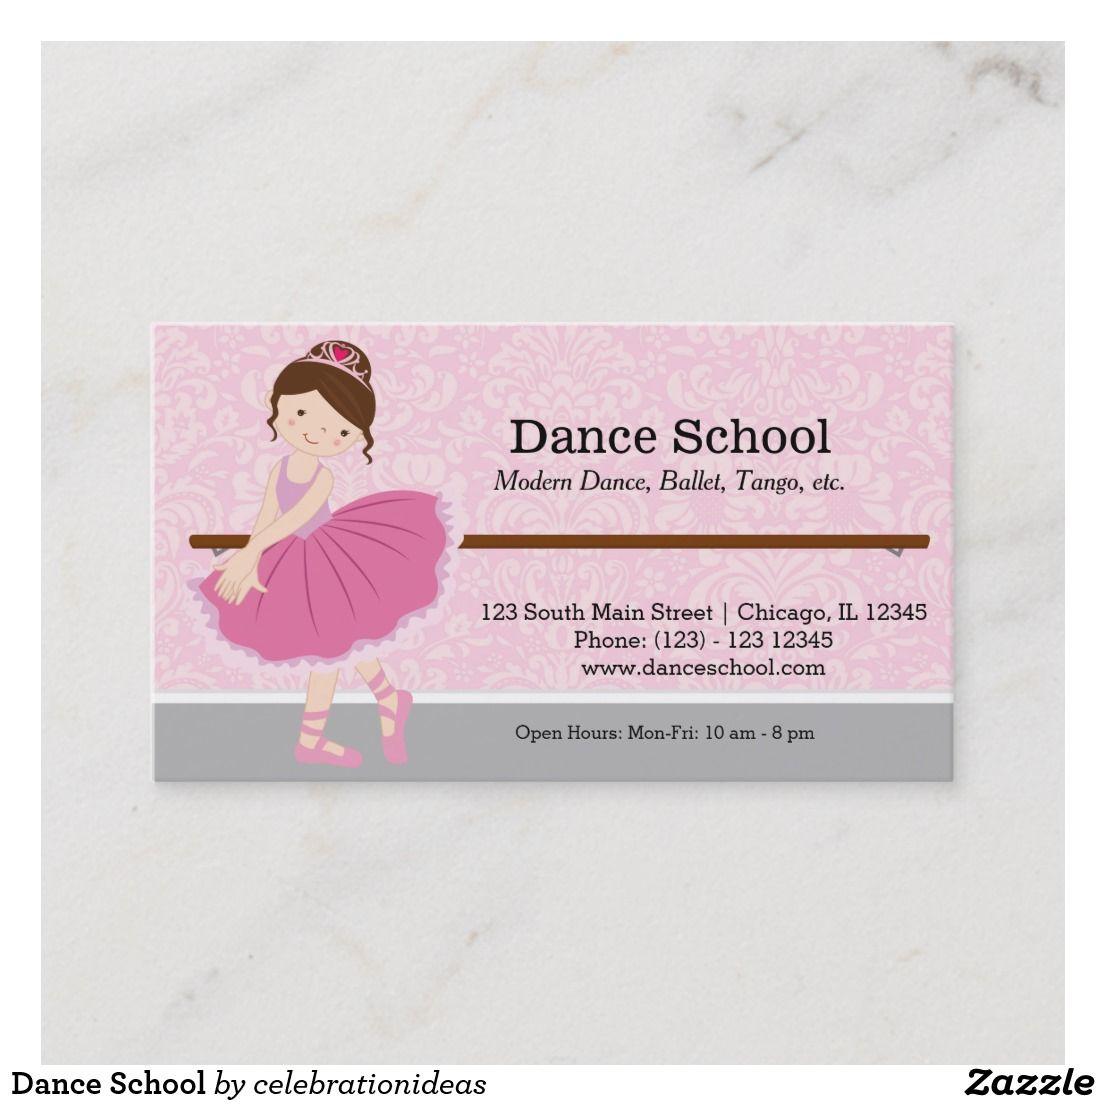 Dance School Business Card Zazzle Com Dance School Business Card Modern Personal Business Cards